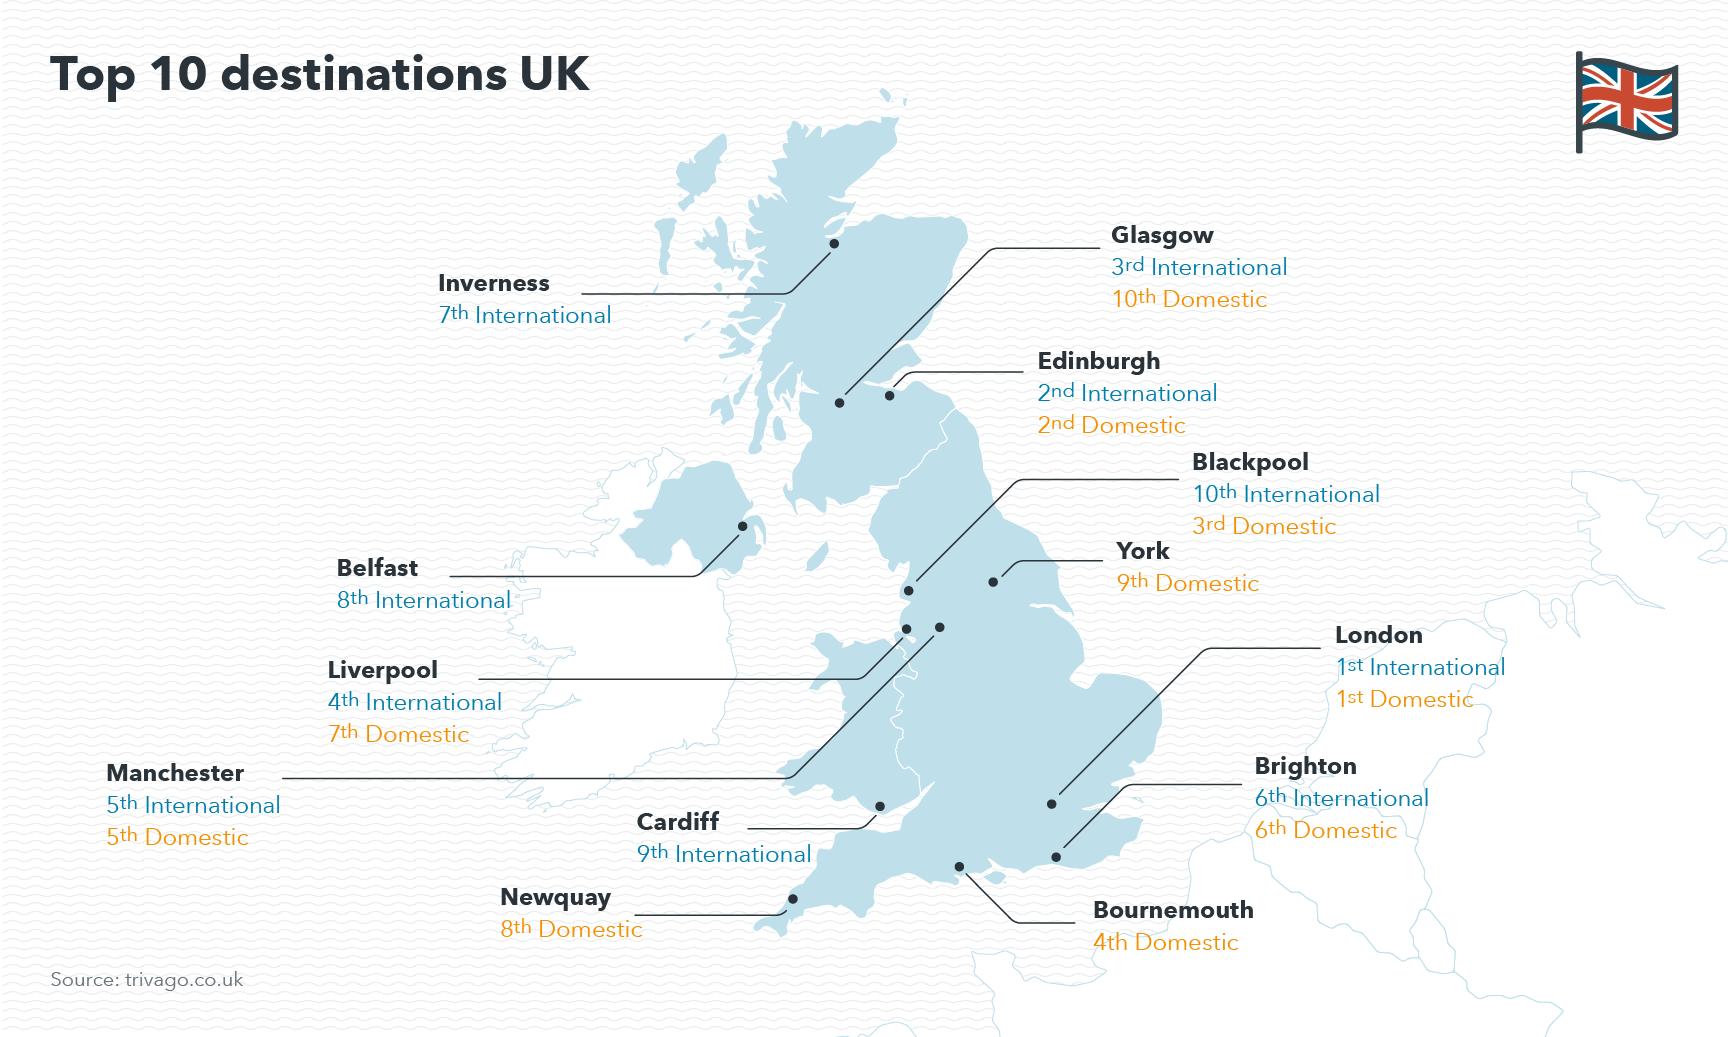 Map showing top ten destinations in the UK